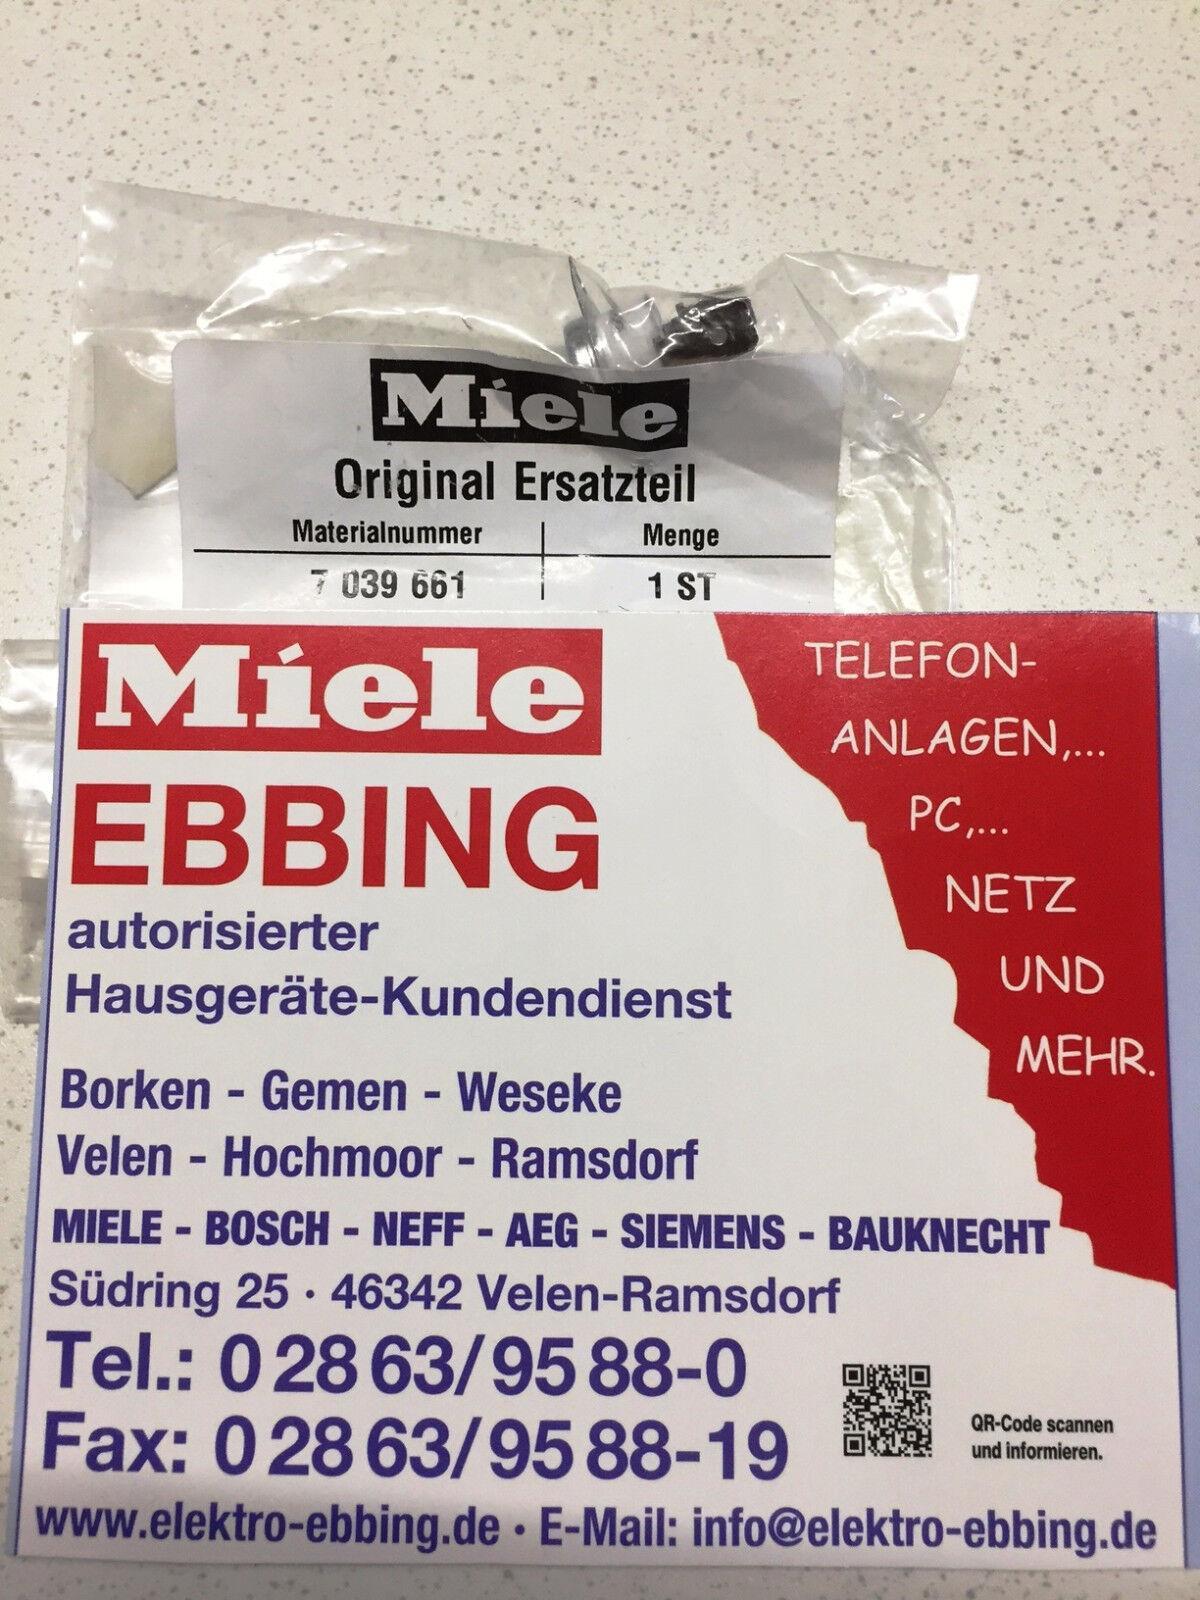 Miele Thermostat 7039661  | Modisch